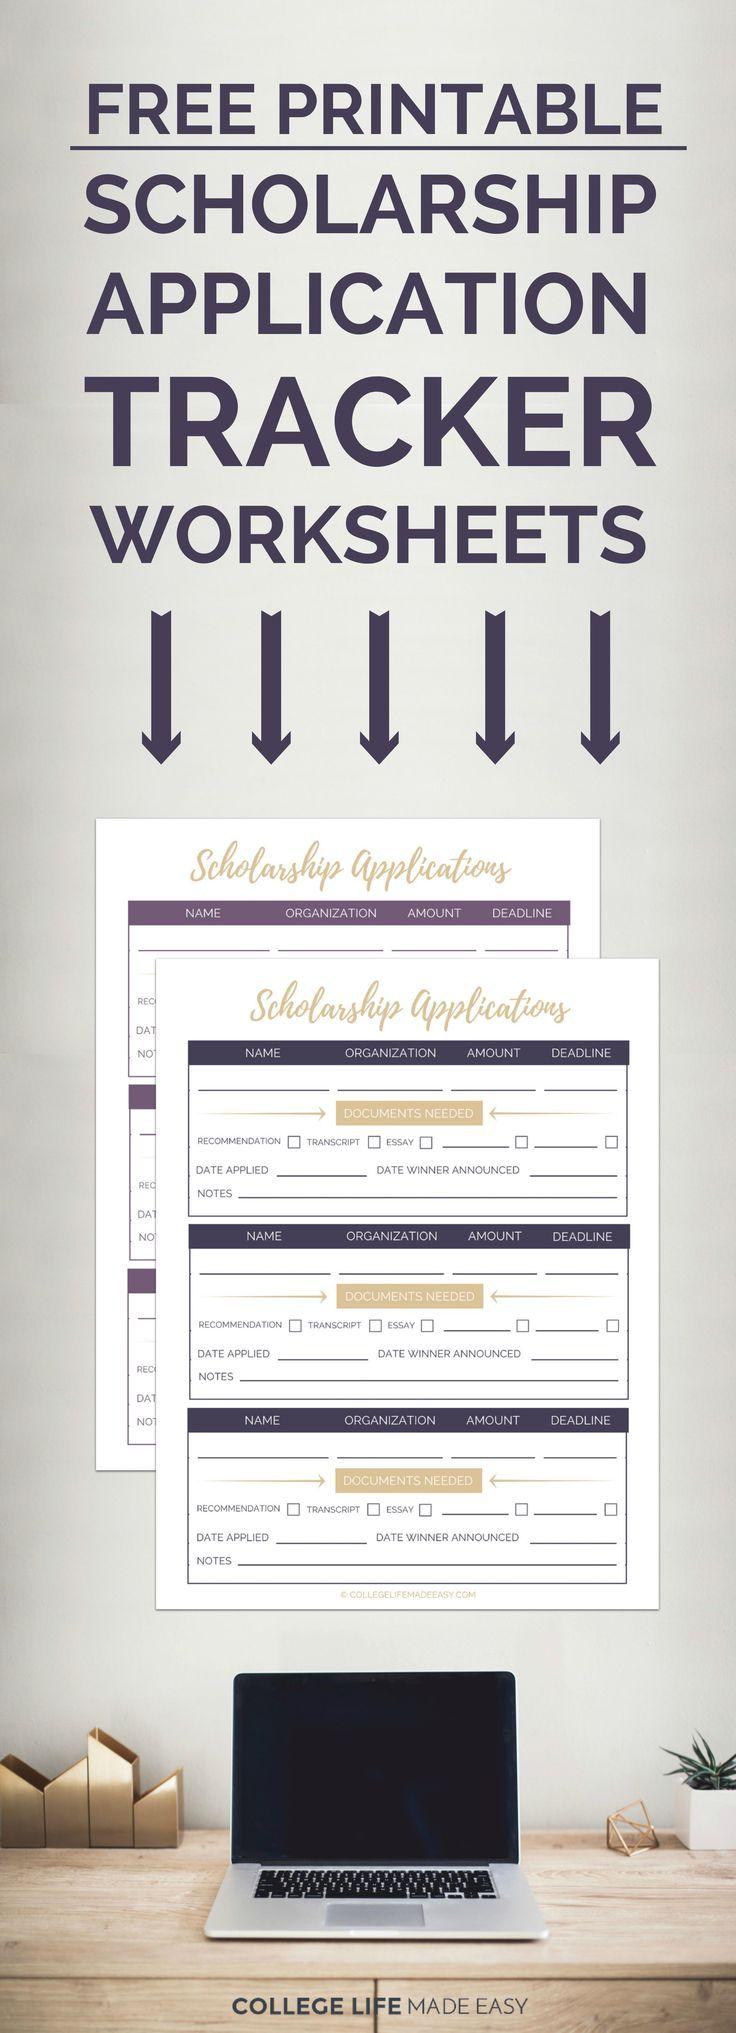 Free Printable Scholarship Application Tracker Worksheets | Scholarship Organizer | High School Student College Student Scholarship Binder | via @esycollegelife